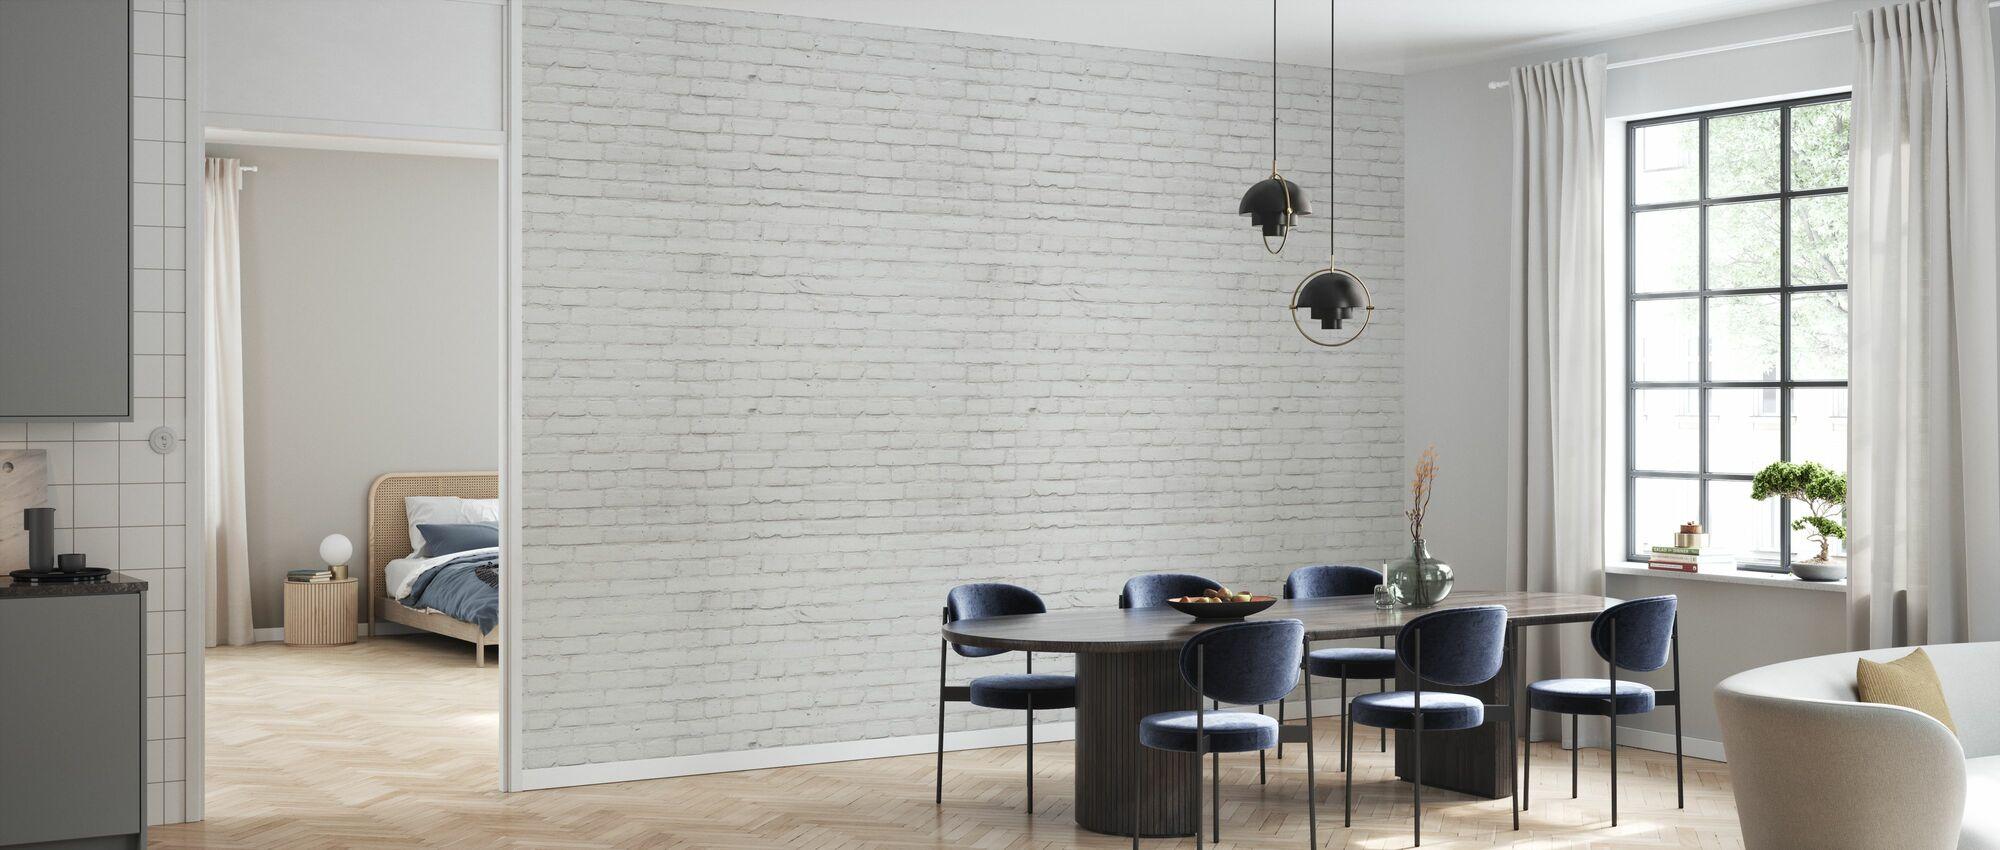 White Dusty Brick Wall - Wallpaper - Kitchen